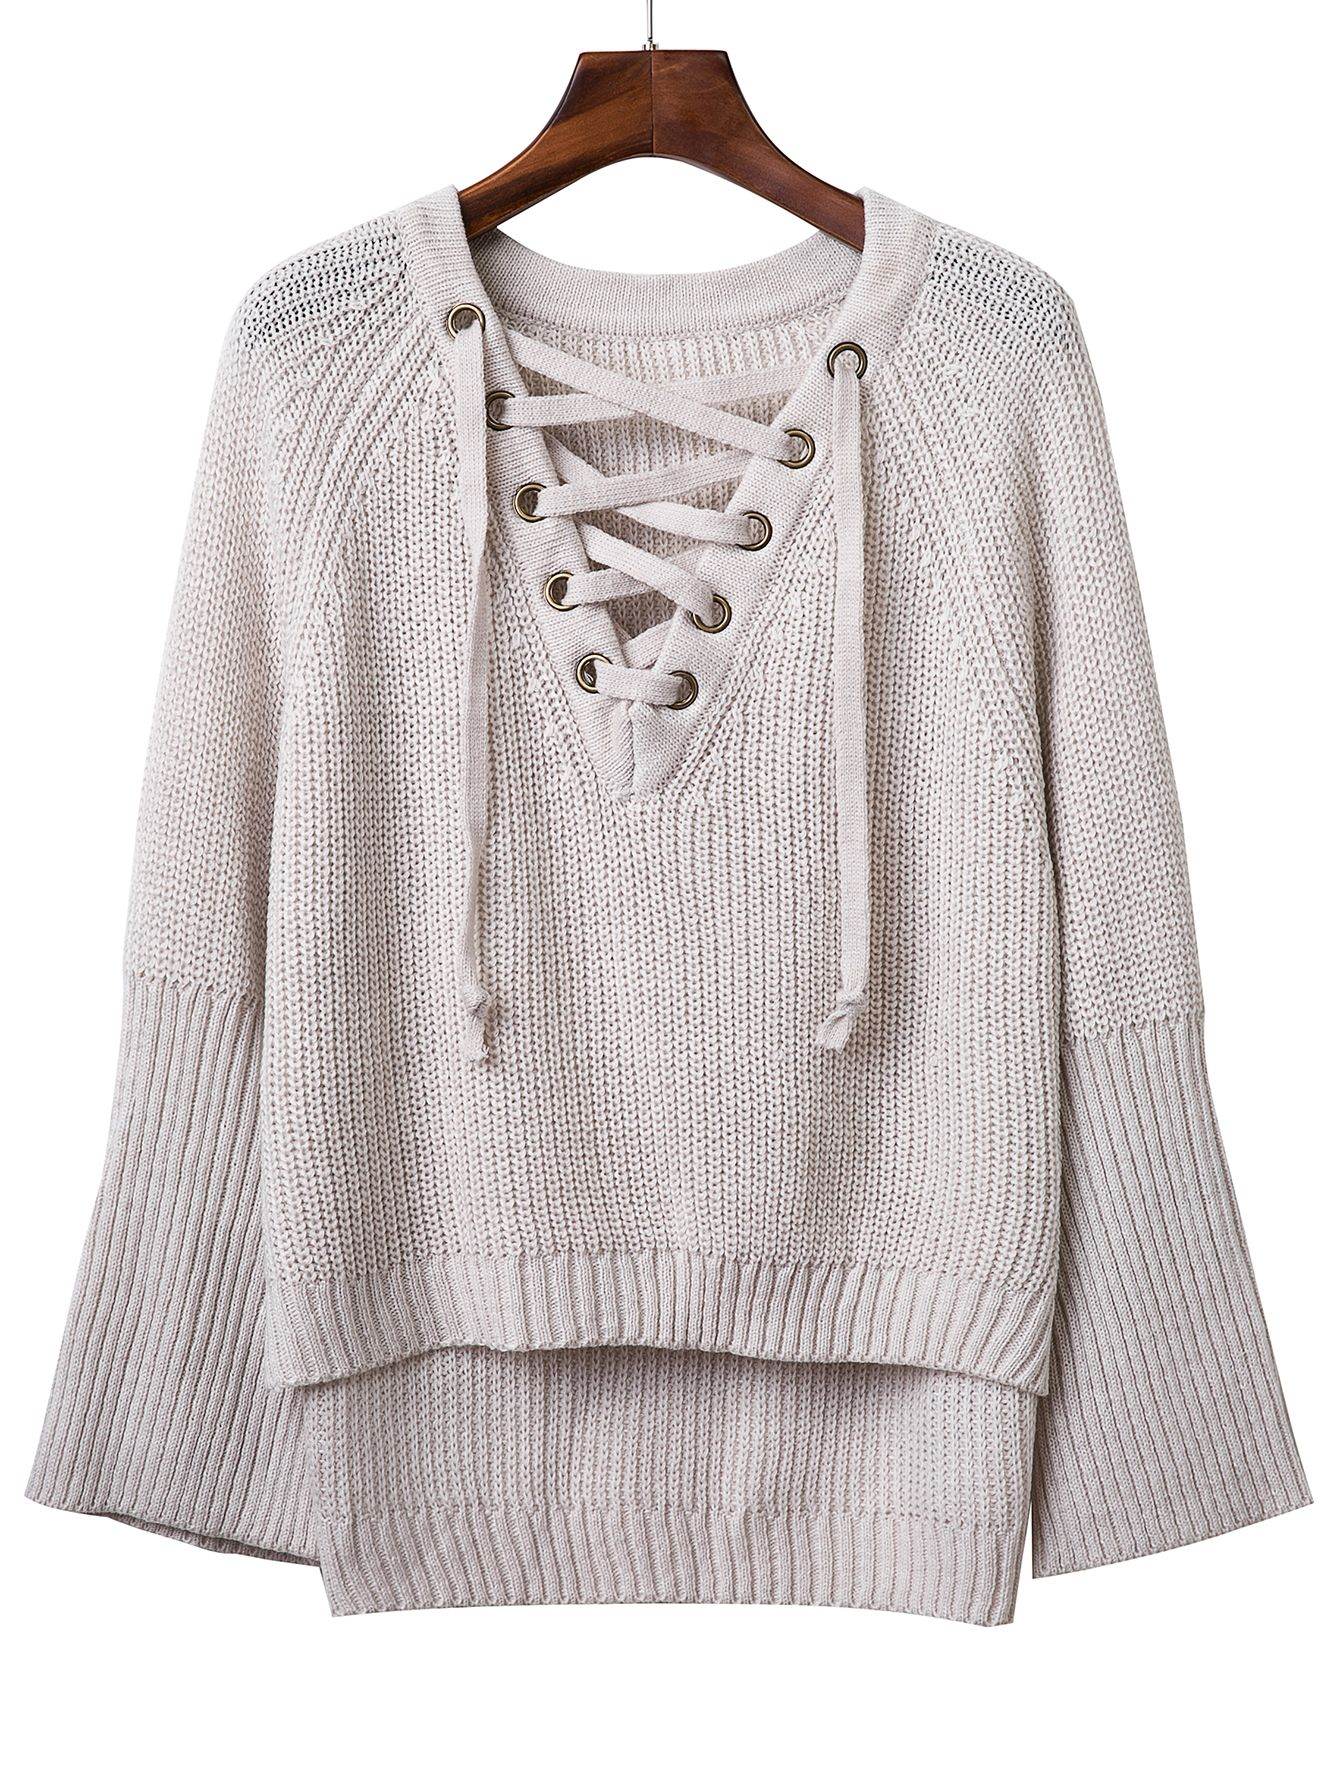 Jersey manga raglán escote V con cordón | Sweater | Pinterest | Ropa ...